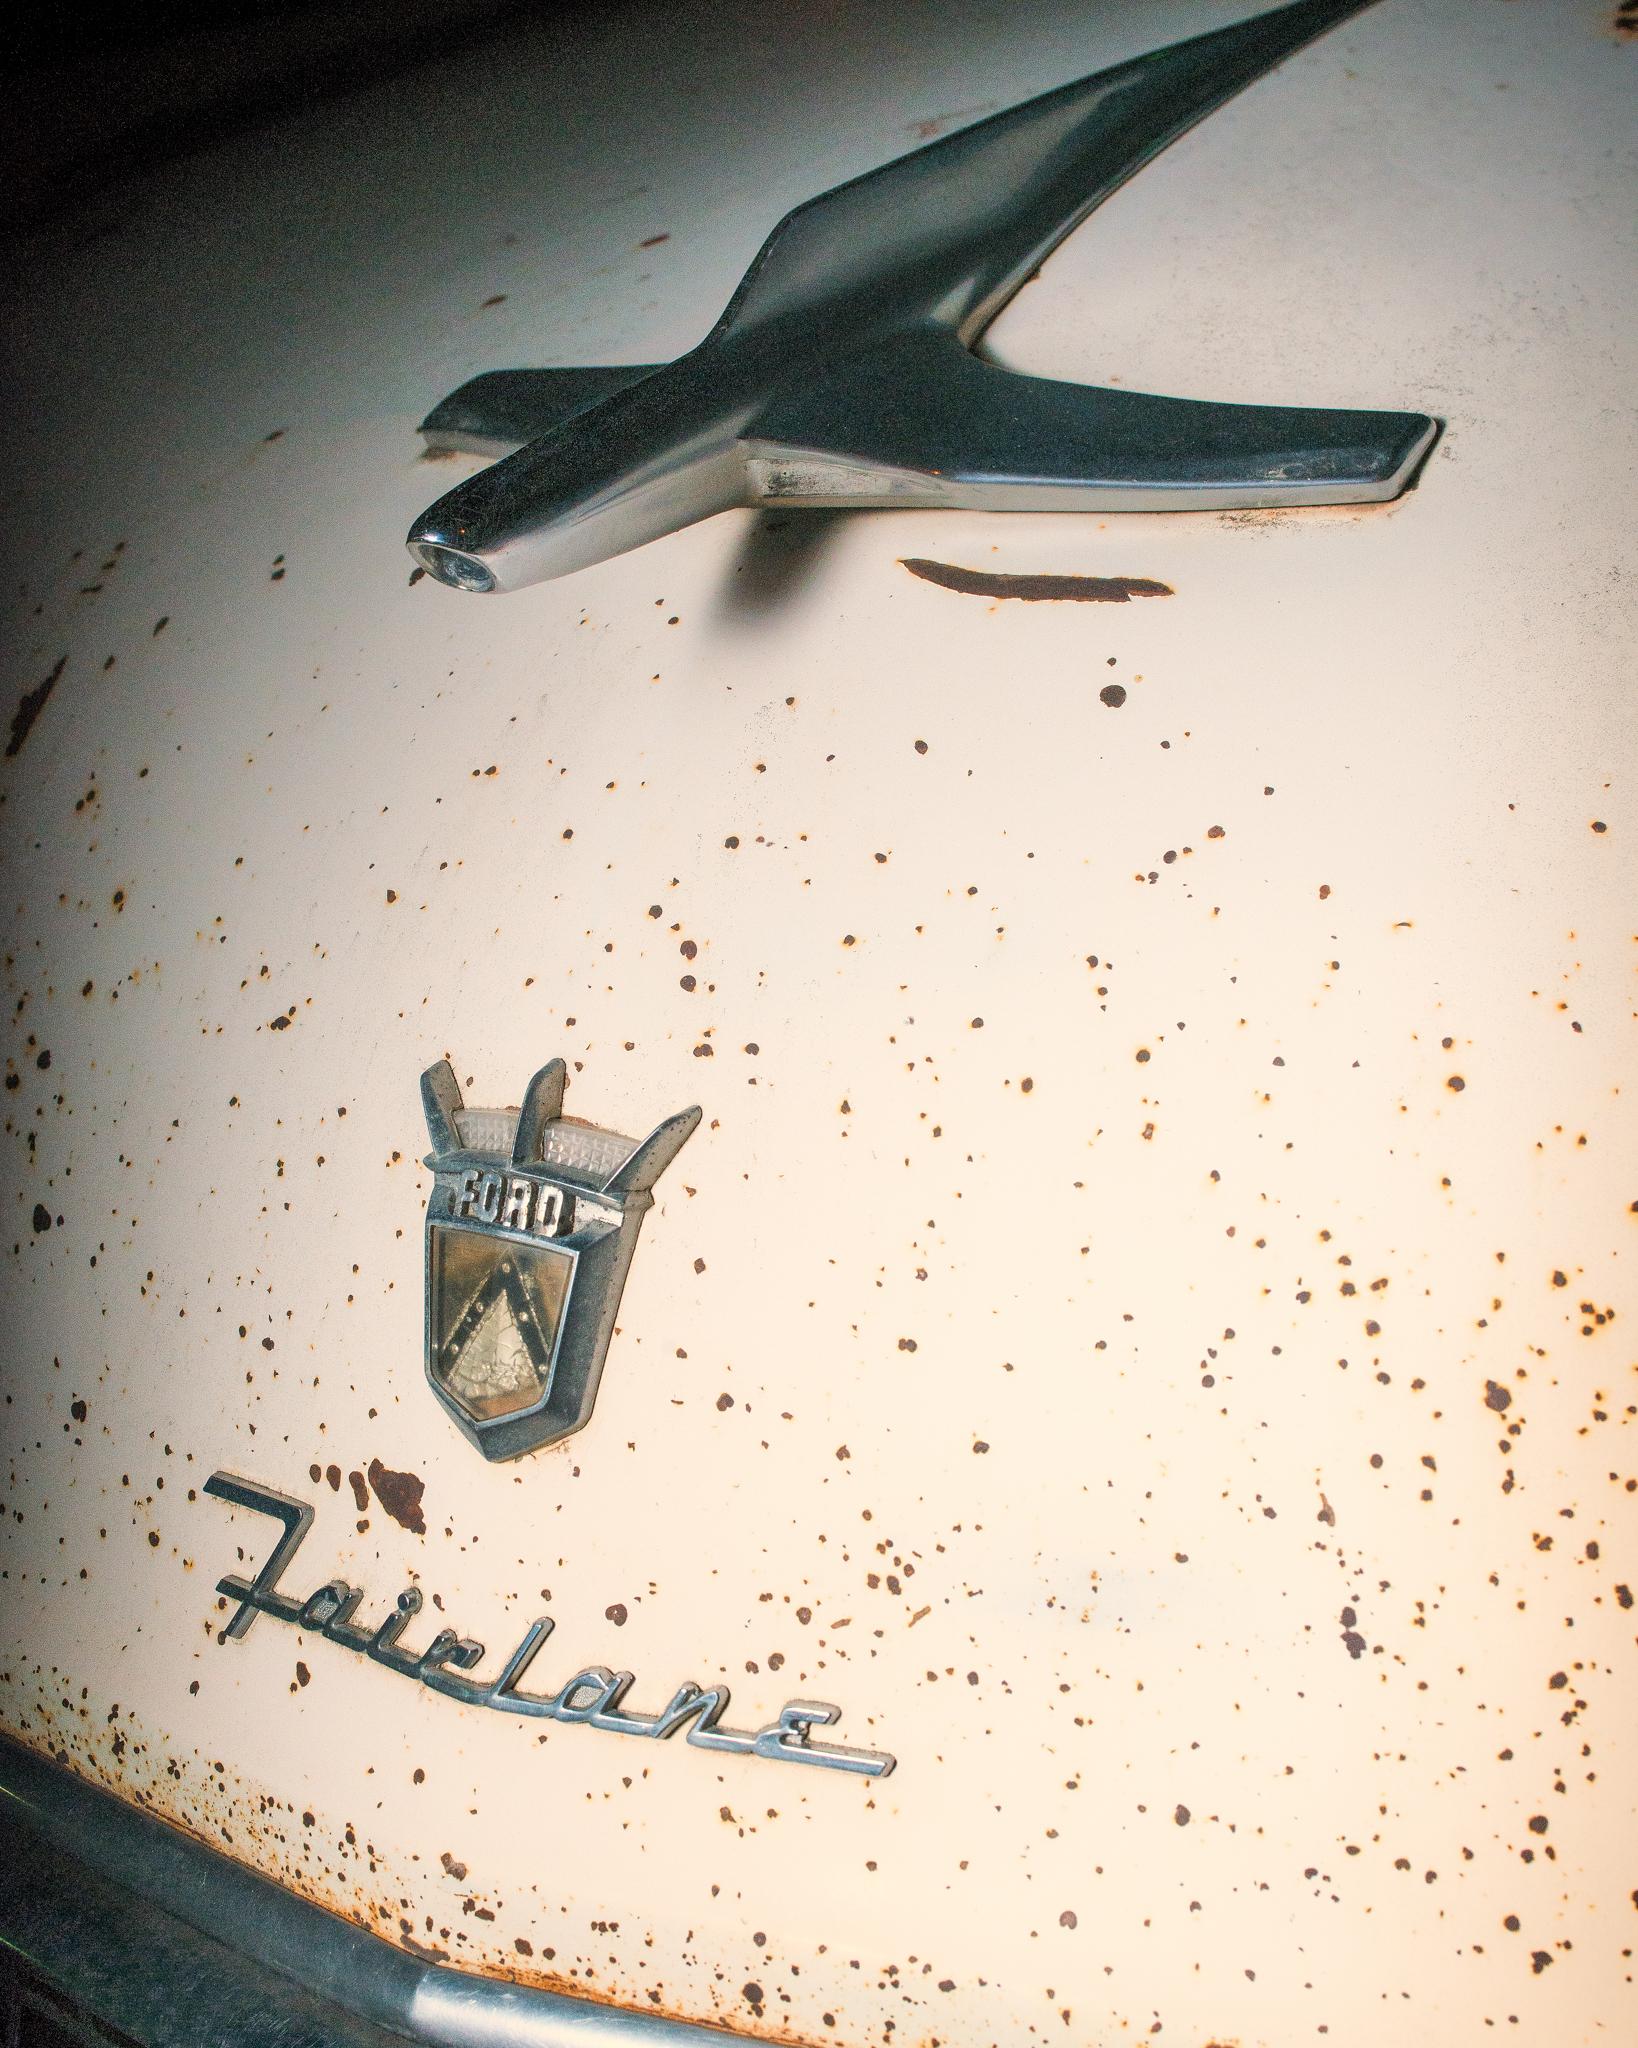 1955 Ford Fairlane Club Sedan #1